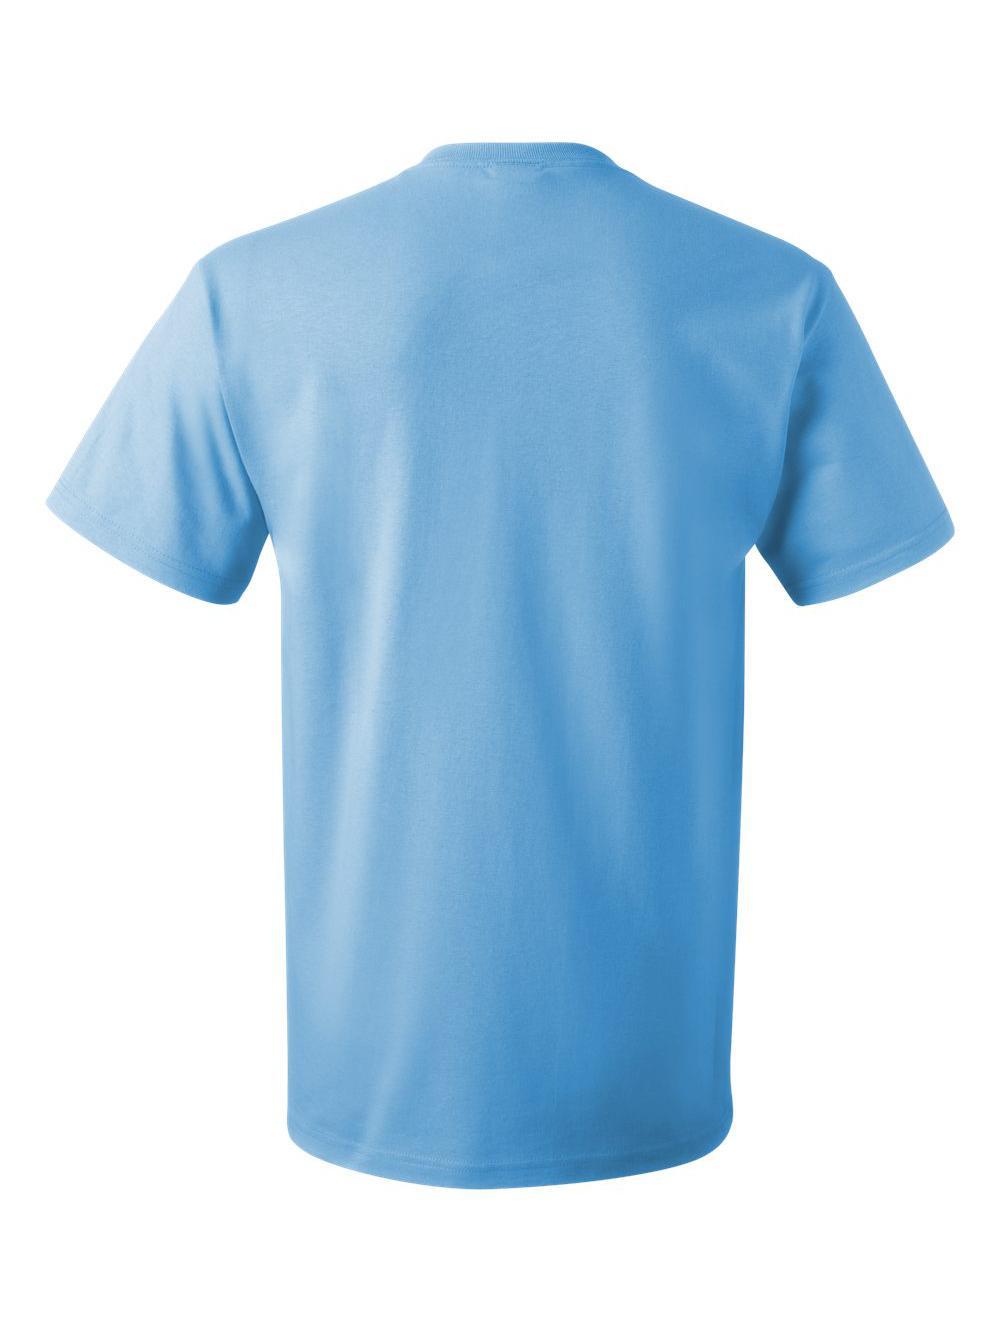 Fruit-of-the-Loom-HD-Cotton-Short-Sleeve-T-Shirt-3930R thumbnail 7